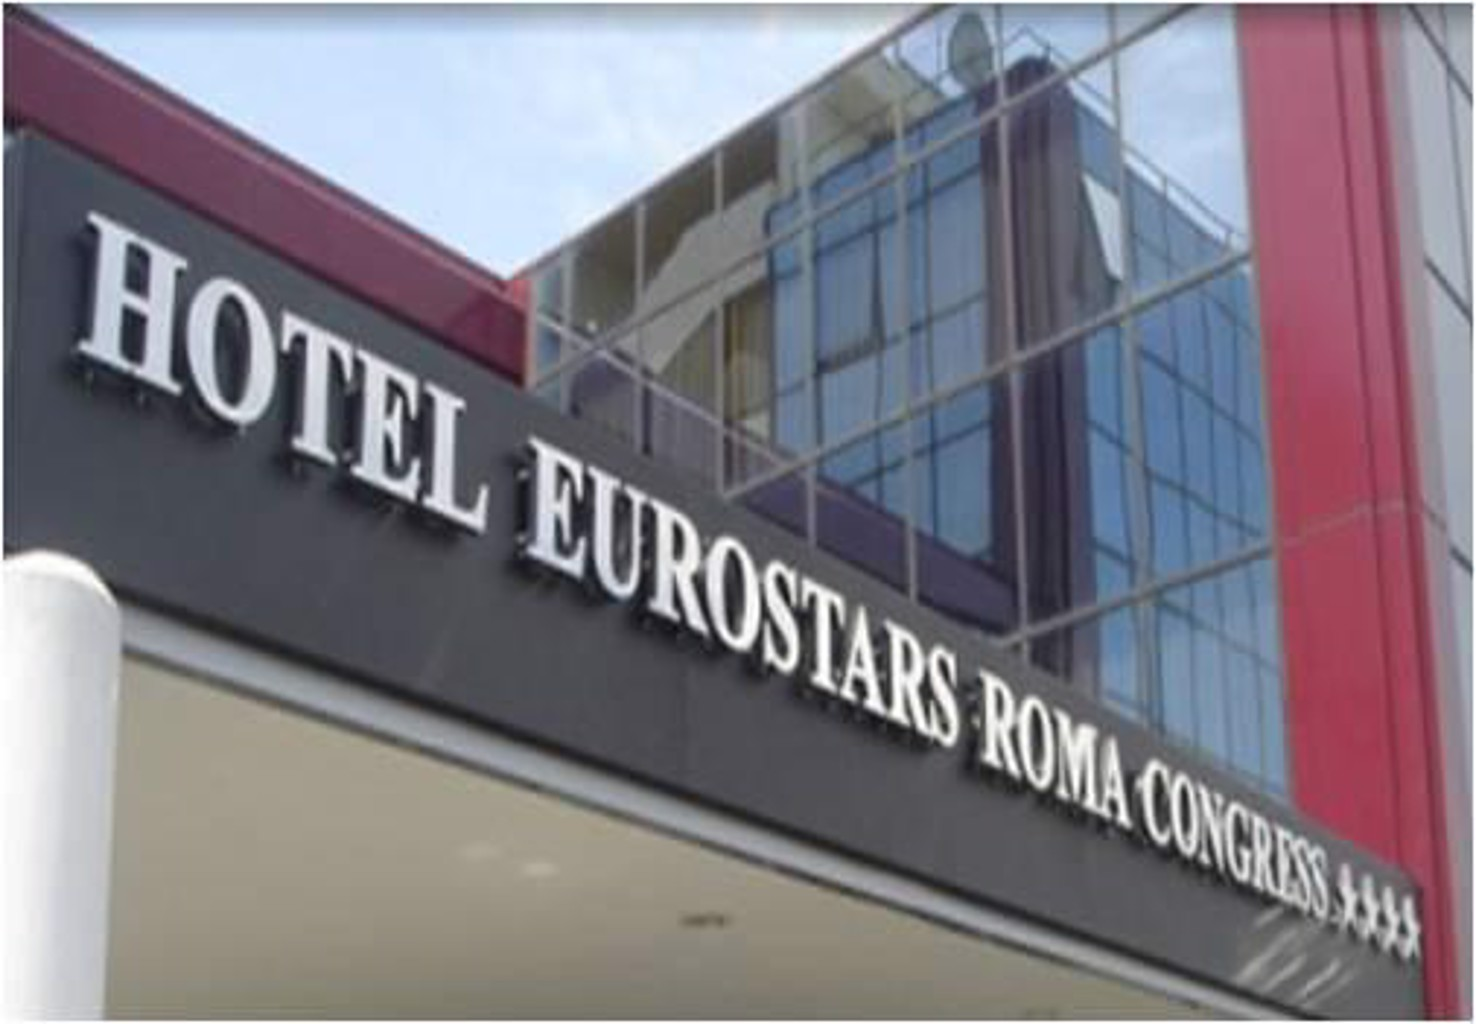 Eurostars Roma Congress